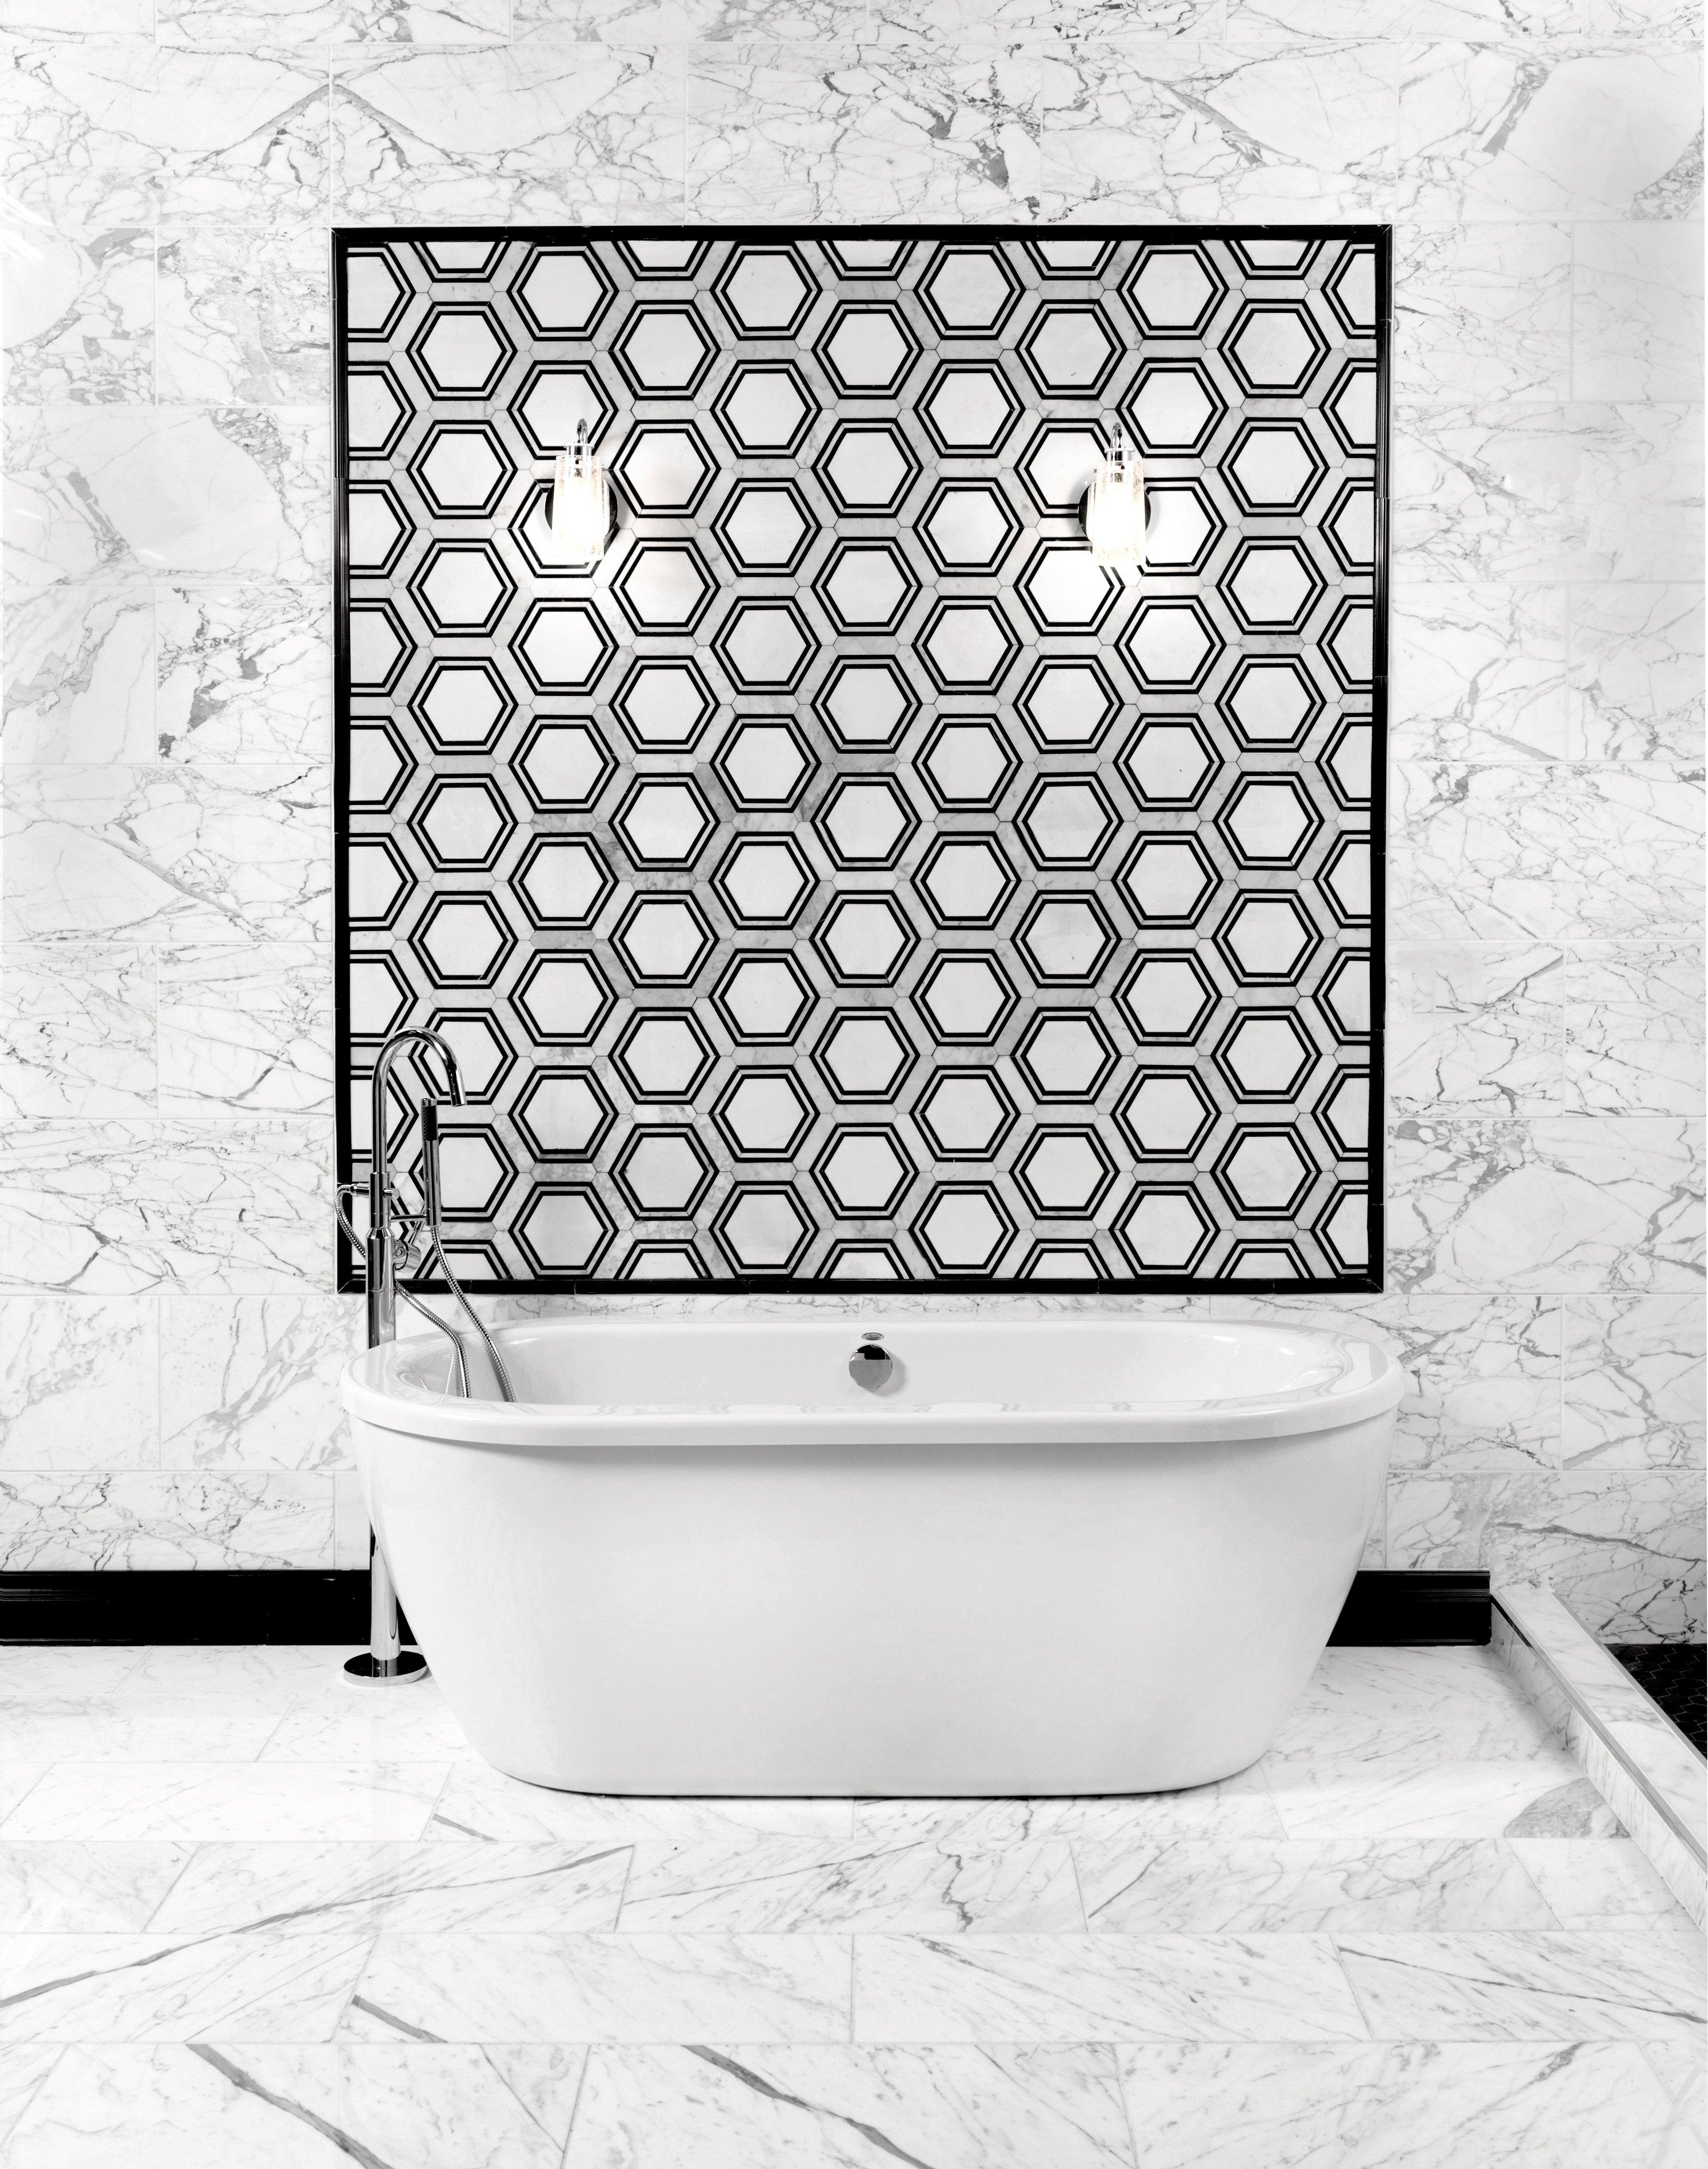 ... Bathroom 1: Statuario Classic Polished Marble Tile Pencil Carrara Thassos Hexagon ...